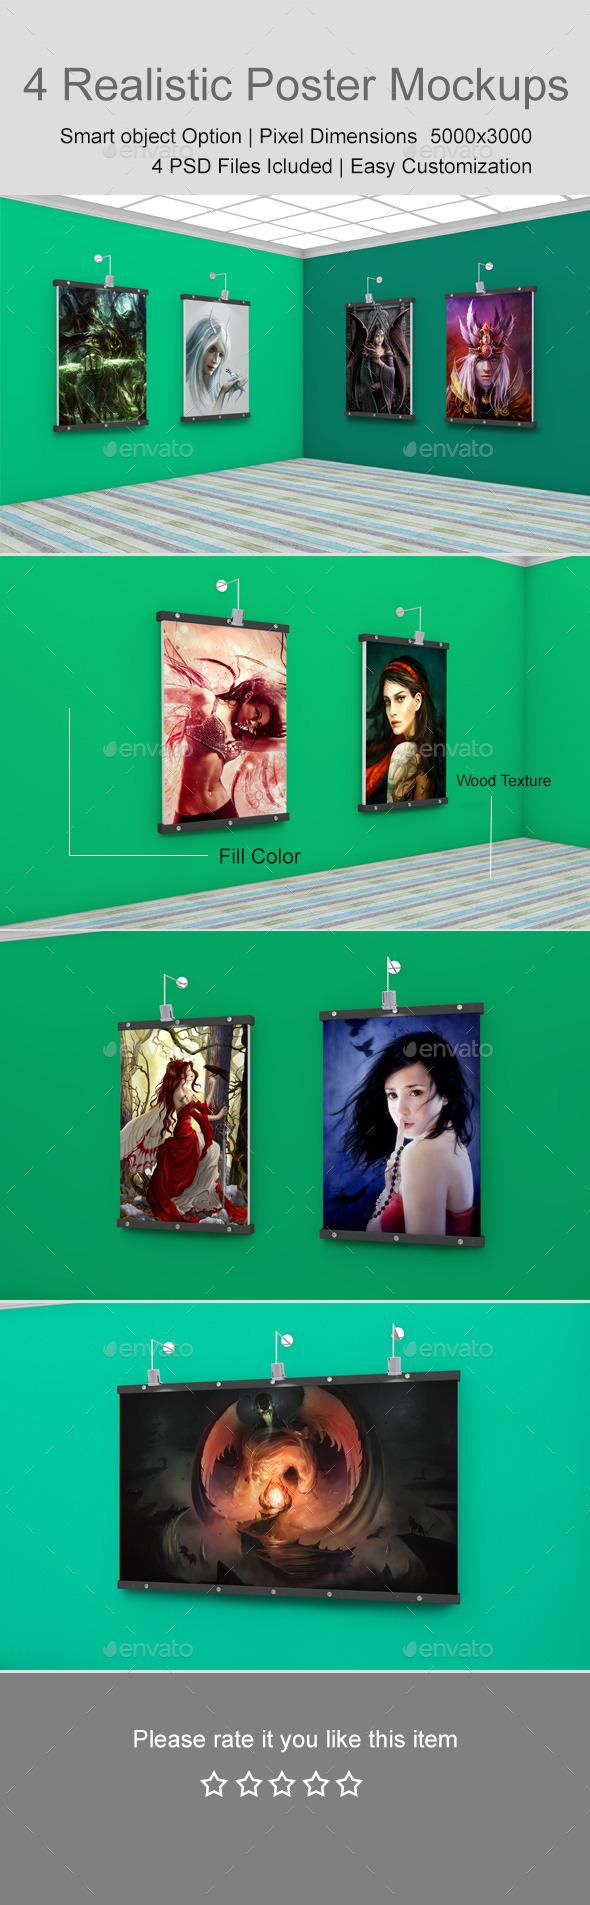 GraphicRiver 4 Realistic Poster Mockups 11526617